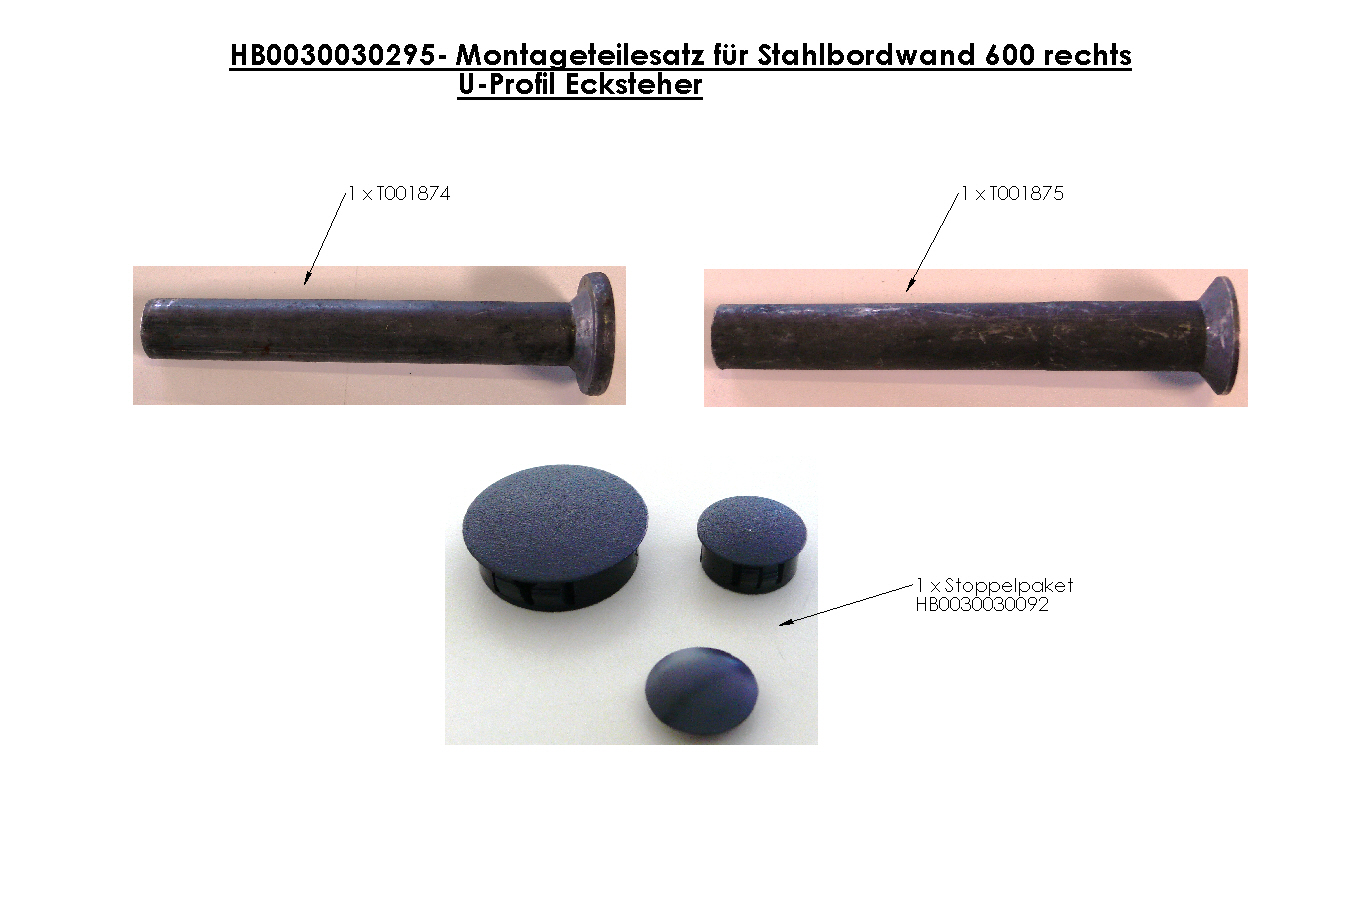 Brantner Kipper und Anhänger - assembly kit for steel sideboard wall 600 right